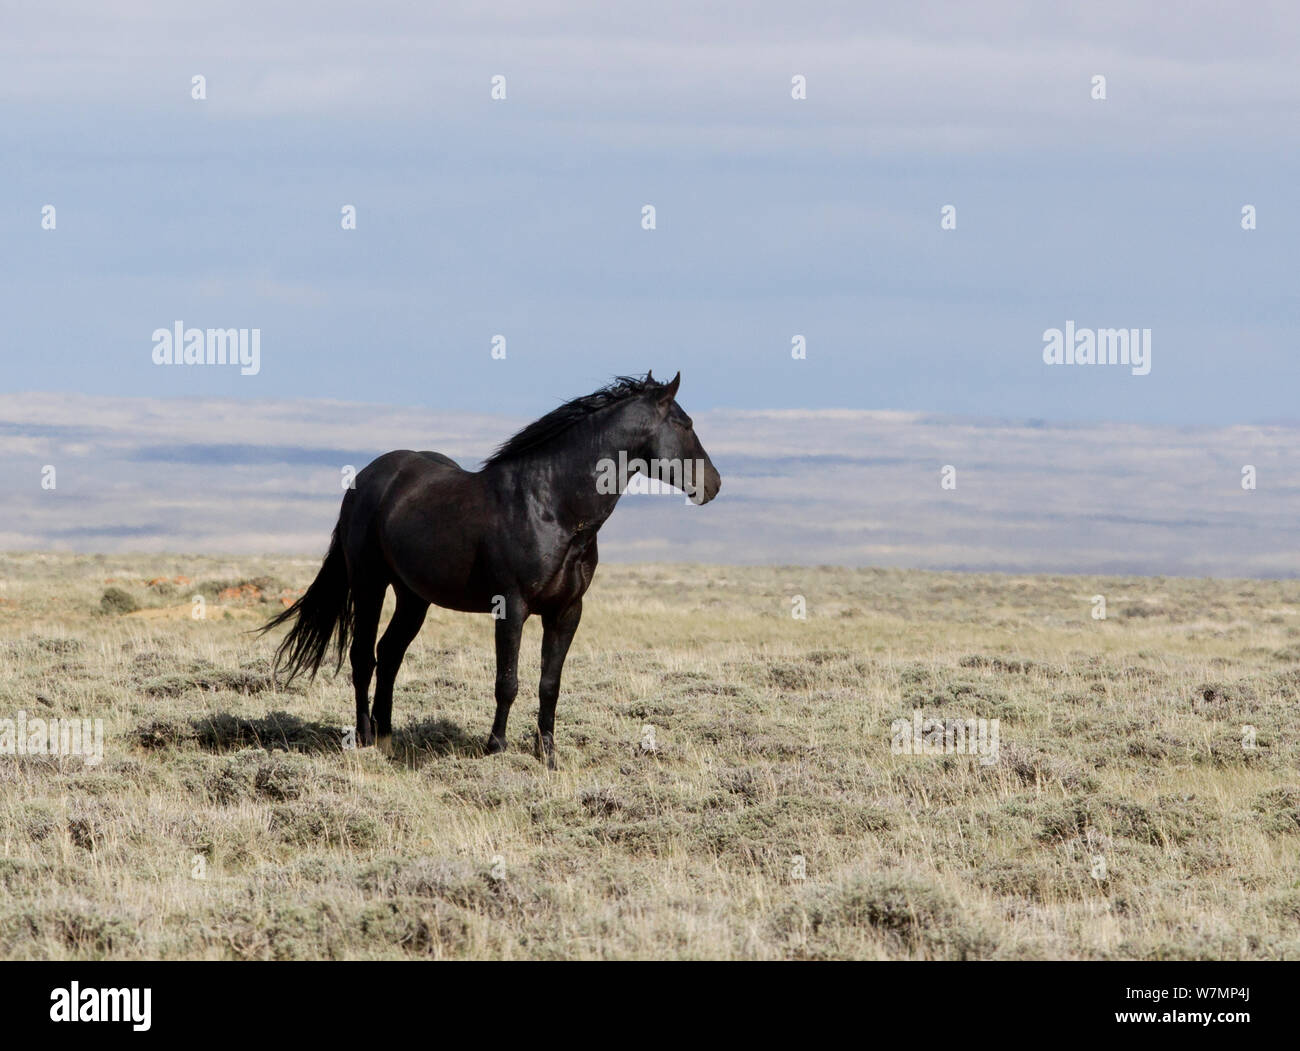 Mustangs Wild Horses Black Stallion Great Divide Basin Wyoming Usa Stock Photo Alamy